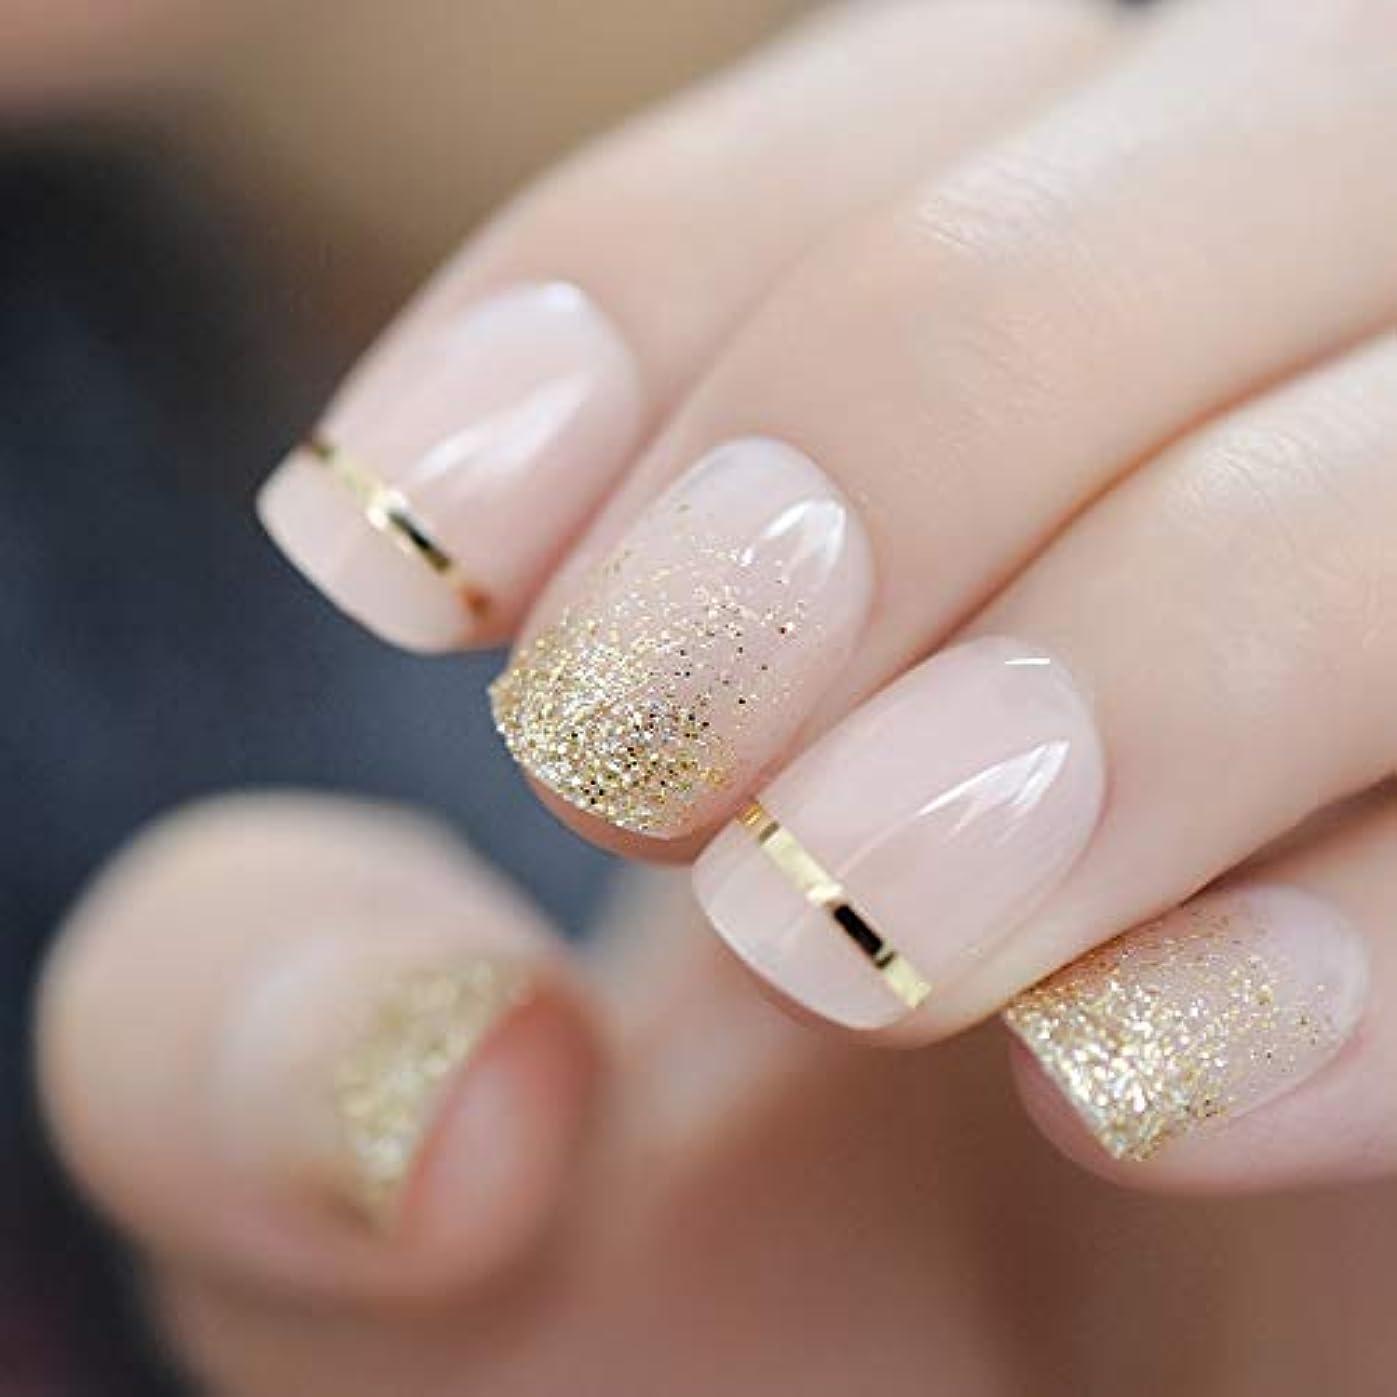 XUTXZKA ファッションショートネイルのヒント偽の爪ゴールドキラキラ人工プレス偽の爪に飾られたフルカバー